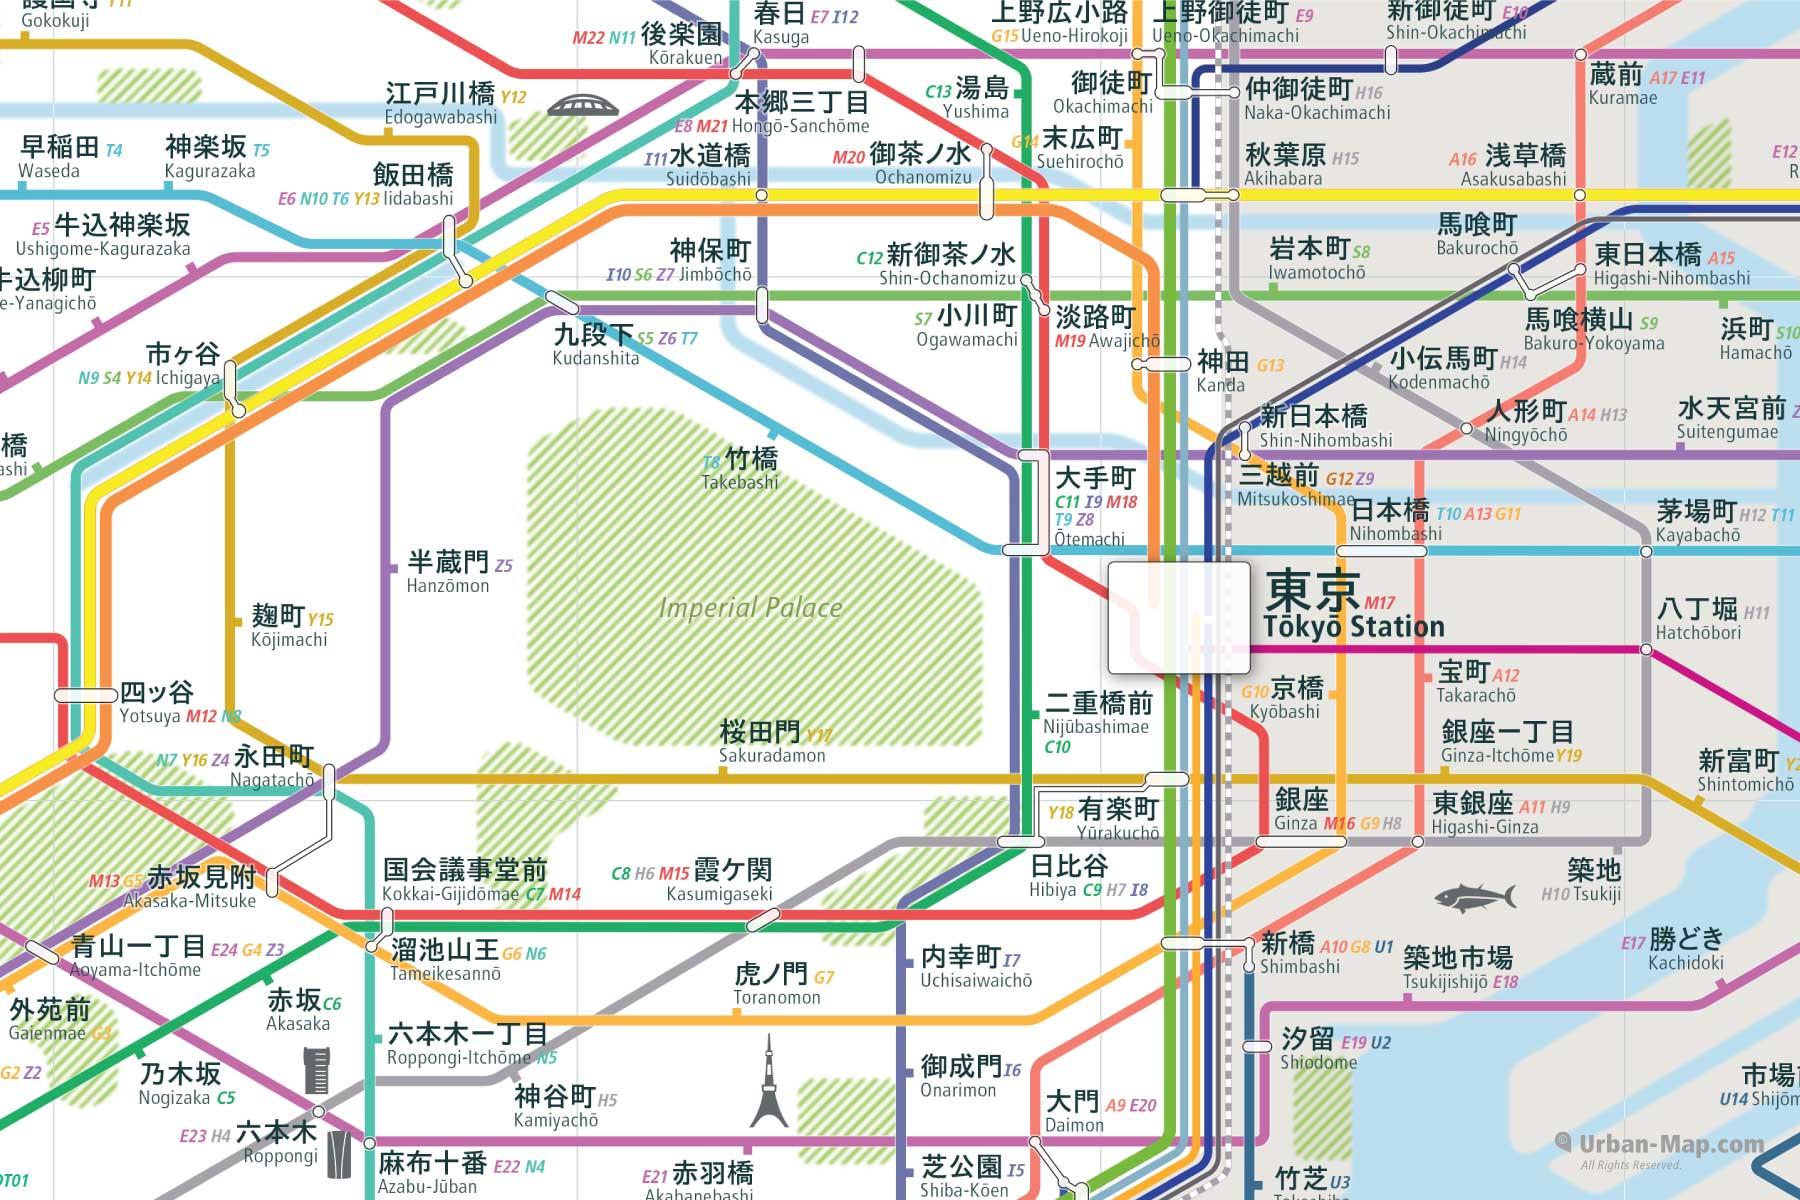 UM-PM-Tokyo-01 Get Directions Walking Google Maps on maps driving directions, maps and directions, map for directions, google world map, bing maps walking directions, google mapss,